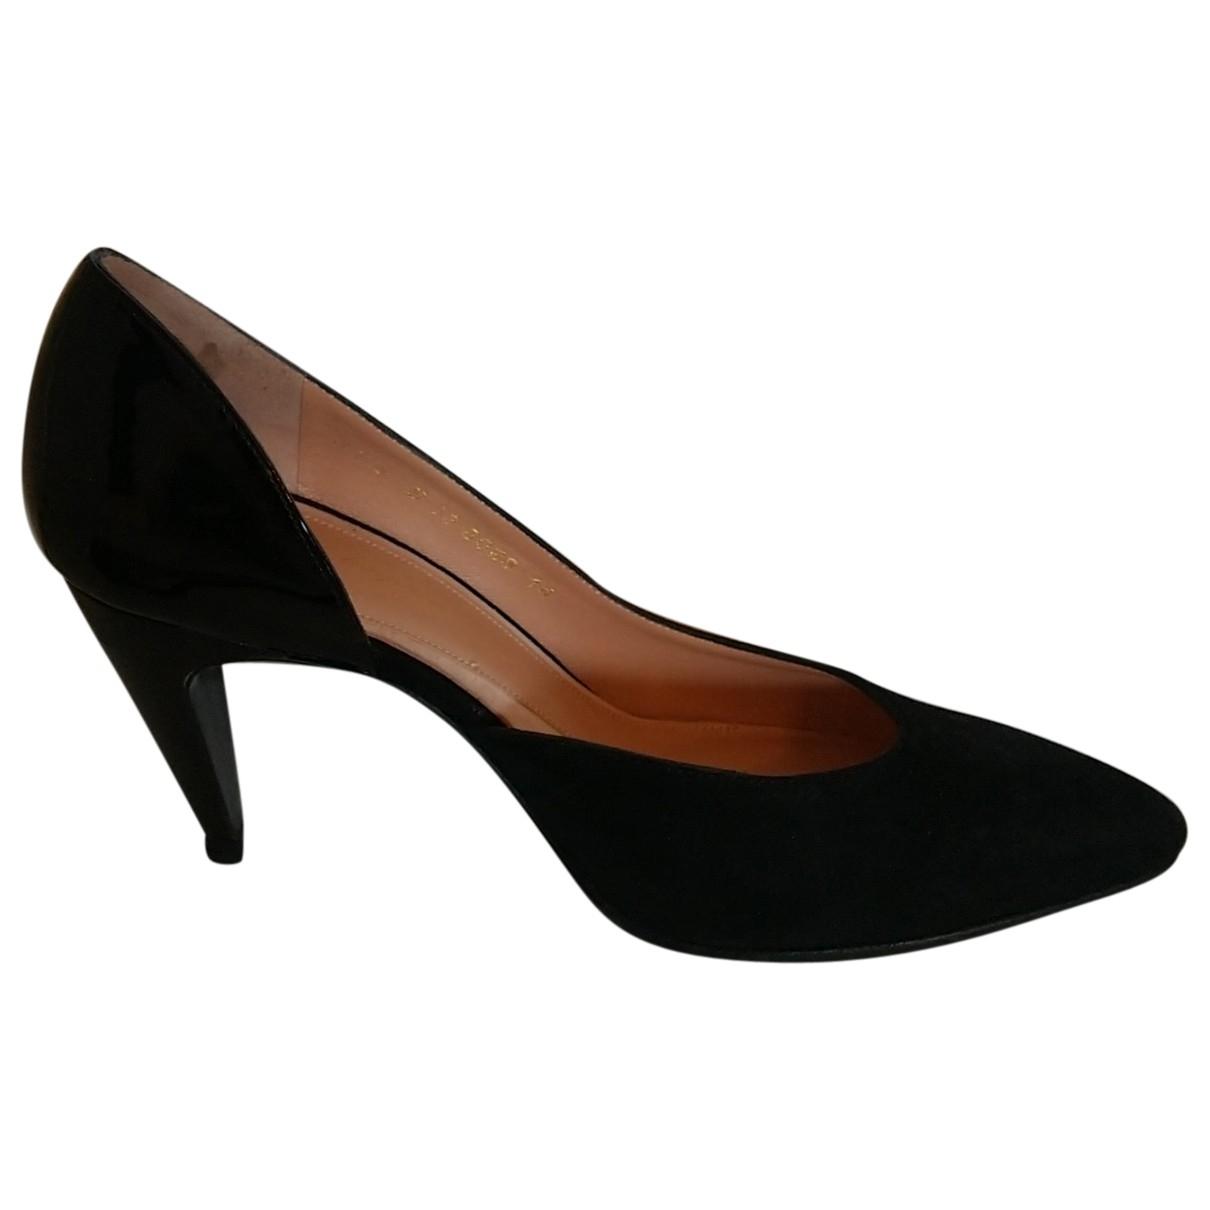 Robert Clergerie \N Black Suede Heels for Women 37.5 EU